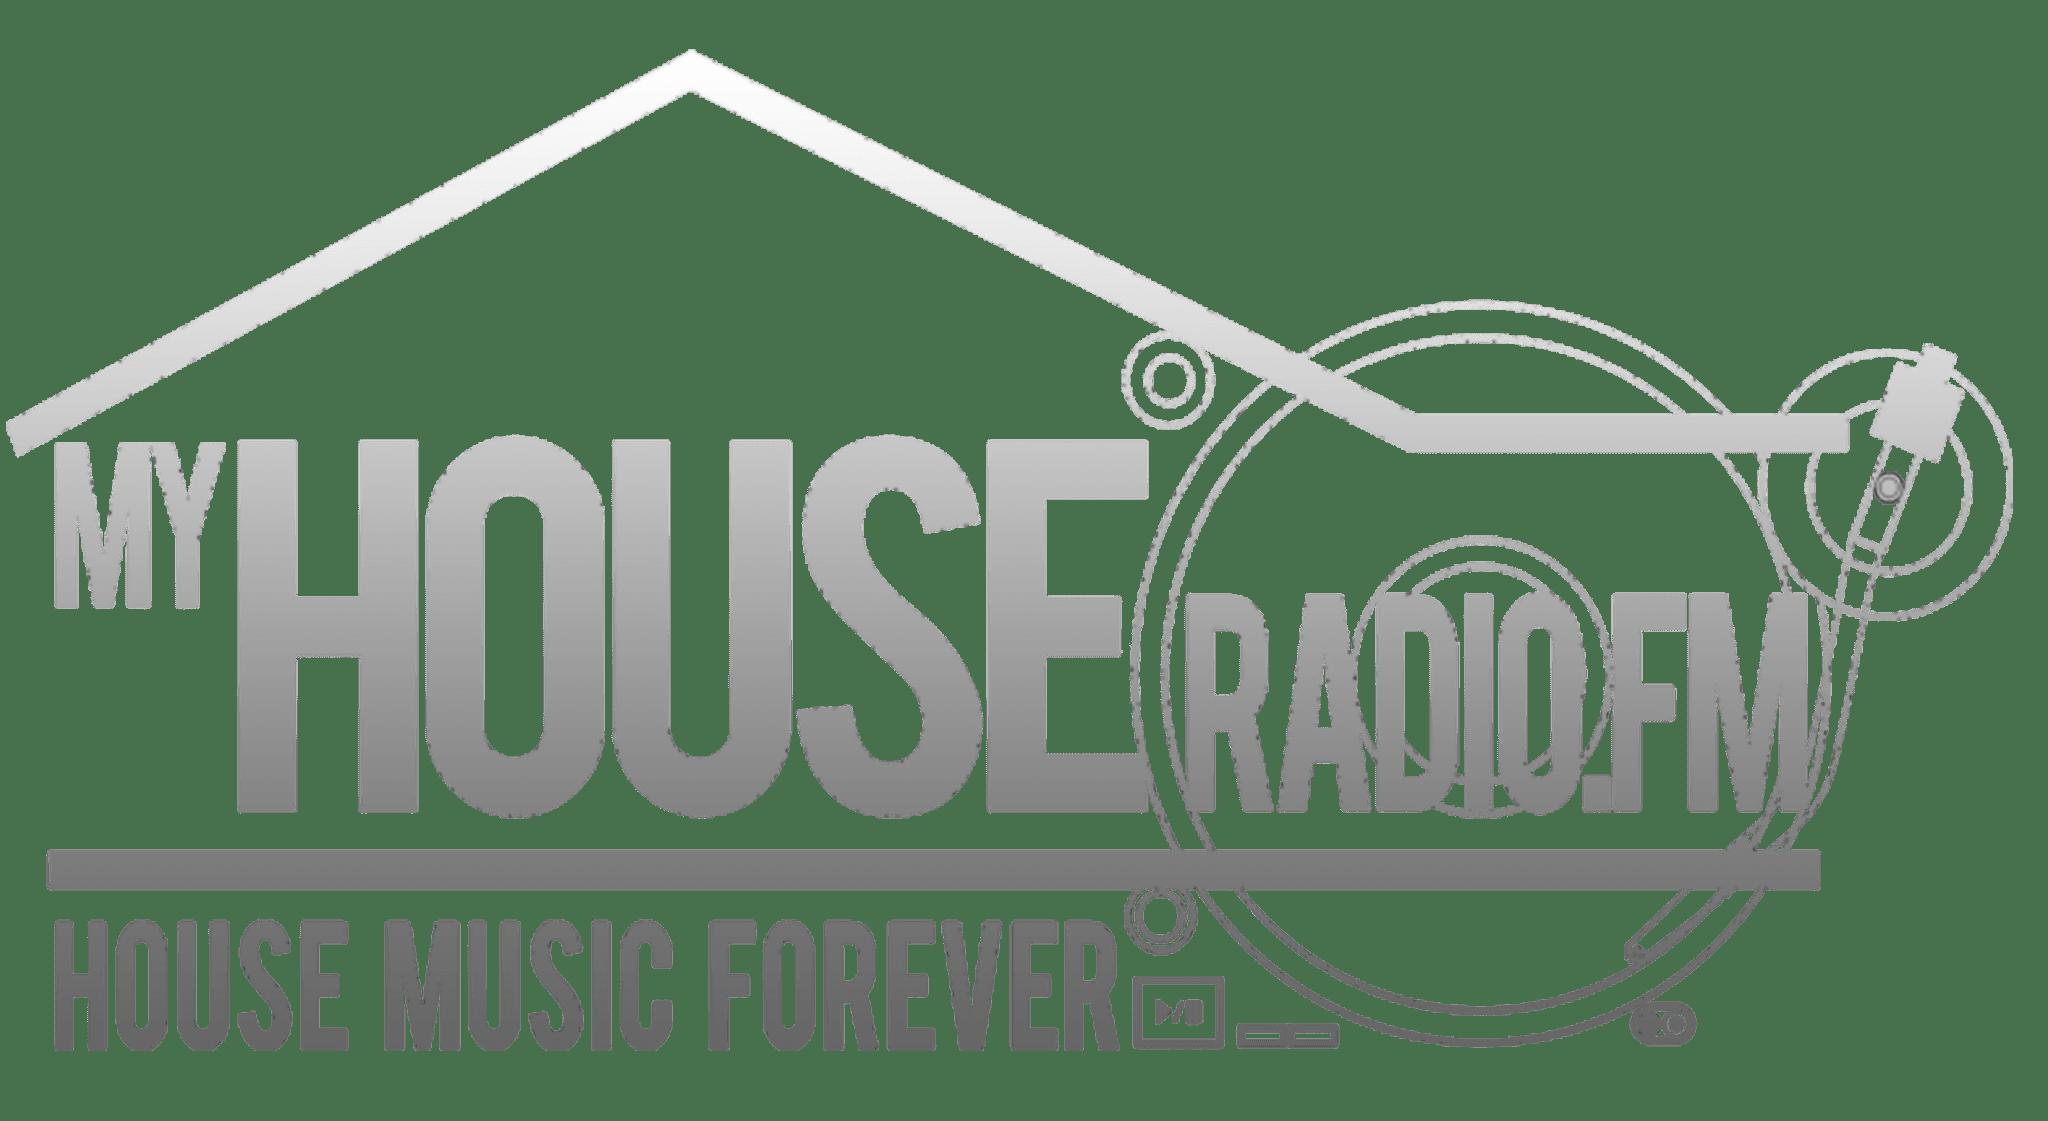 http://www.myhouseradio.fm/0718_MHR_Logo_White_Gradient_I_Lg.png